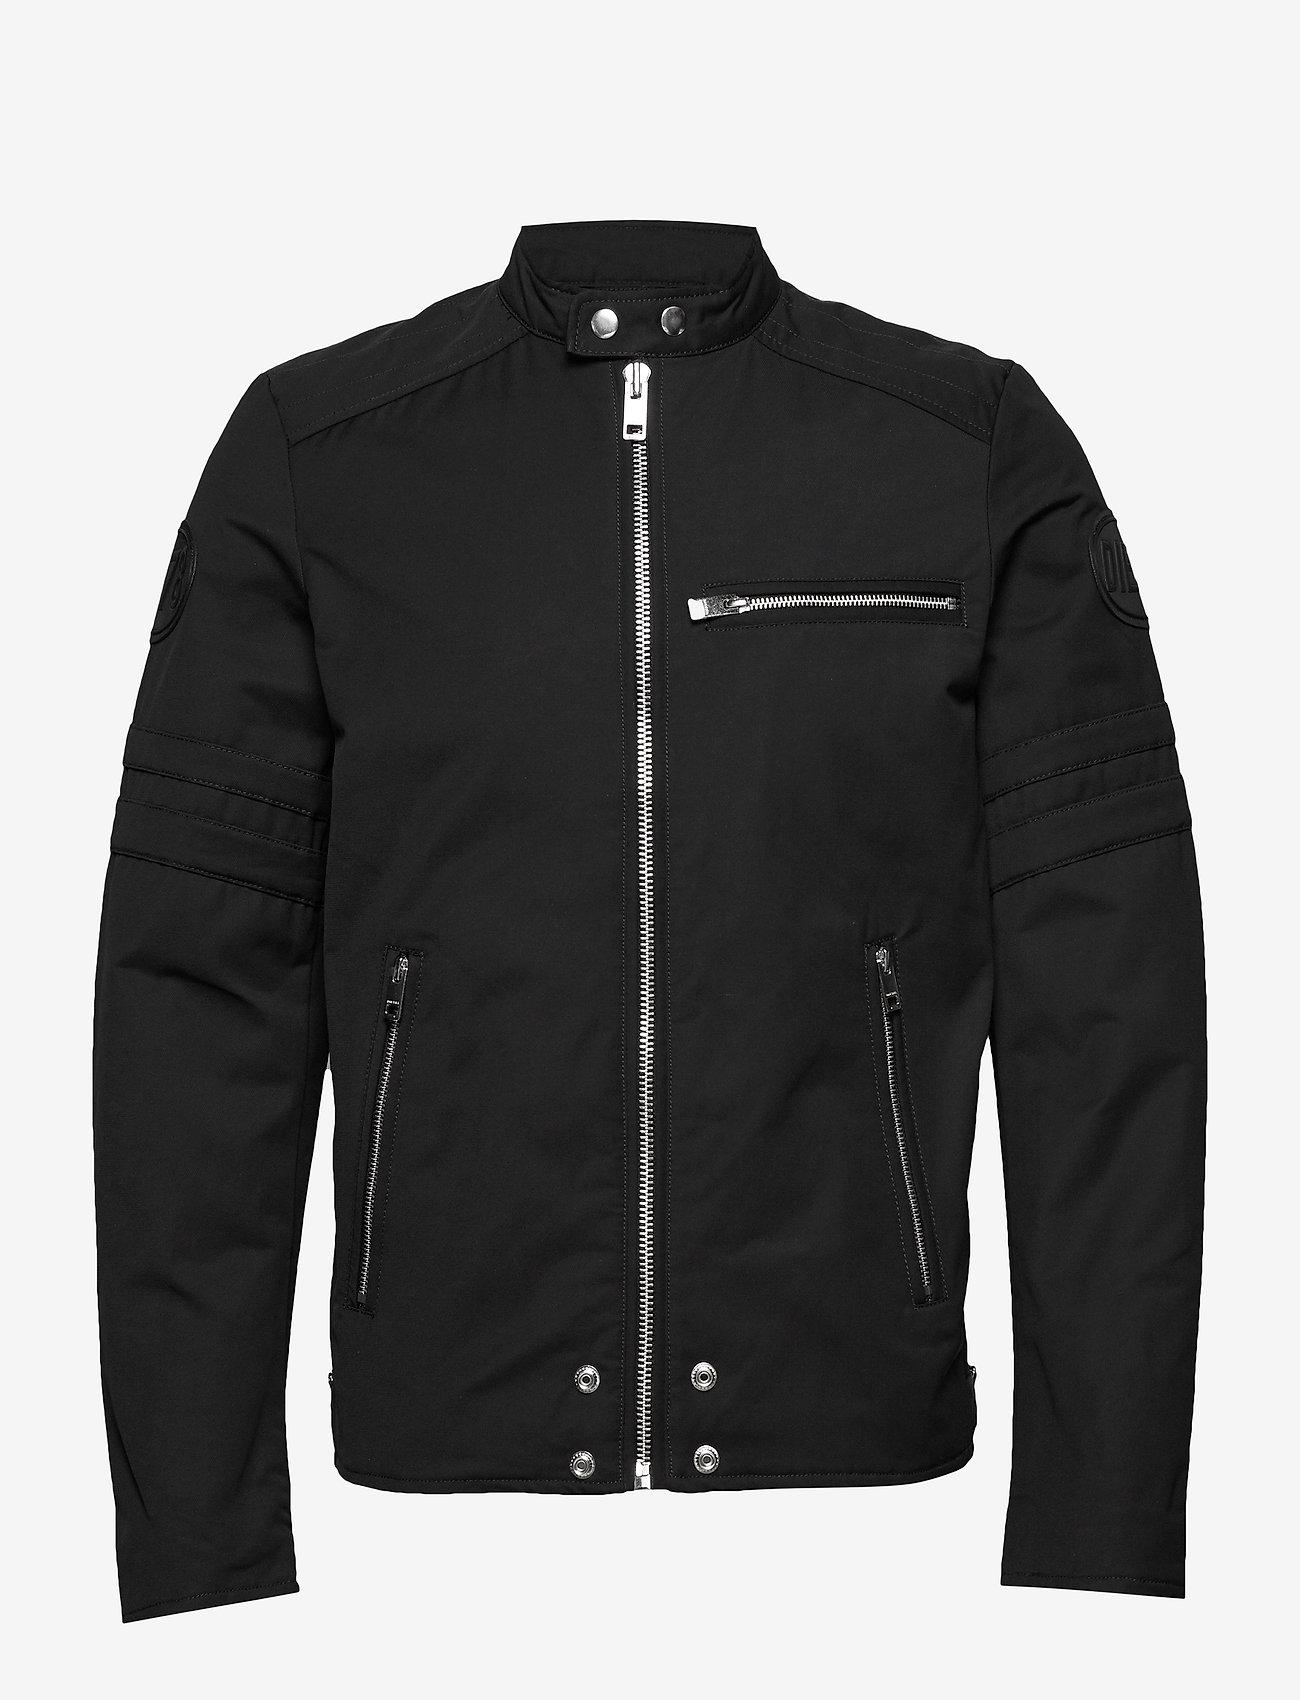 Diesel Men - J-GLORY GIACCA JACKET - light jackets - black - 0